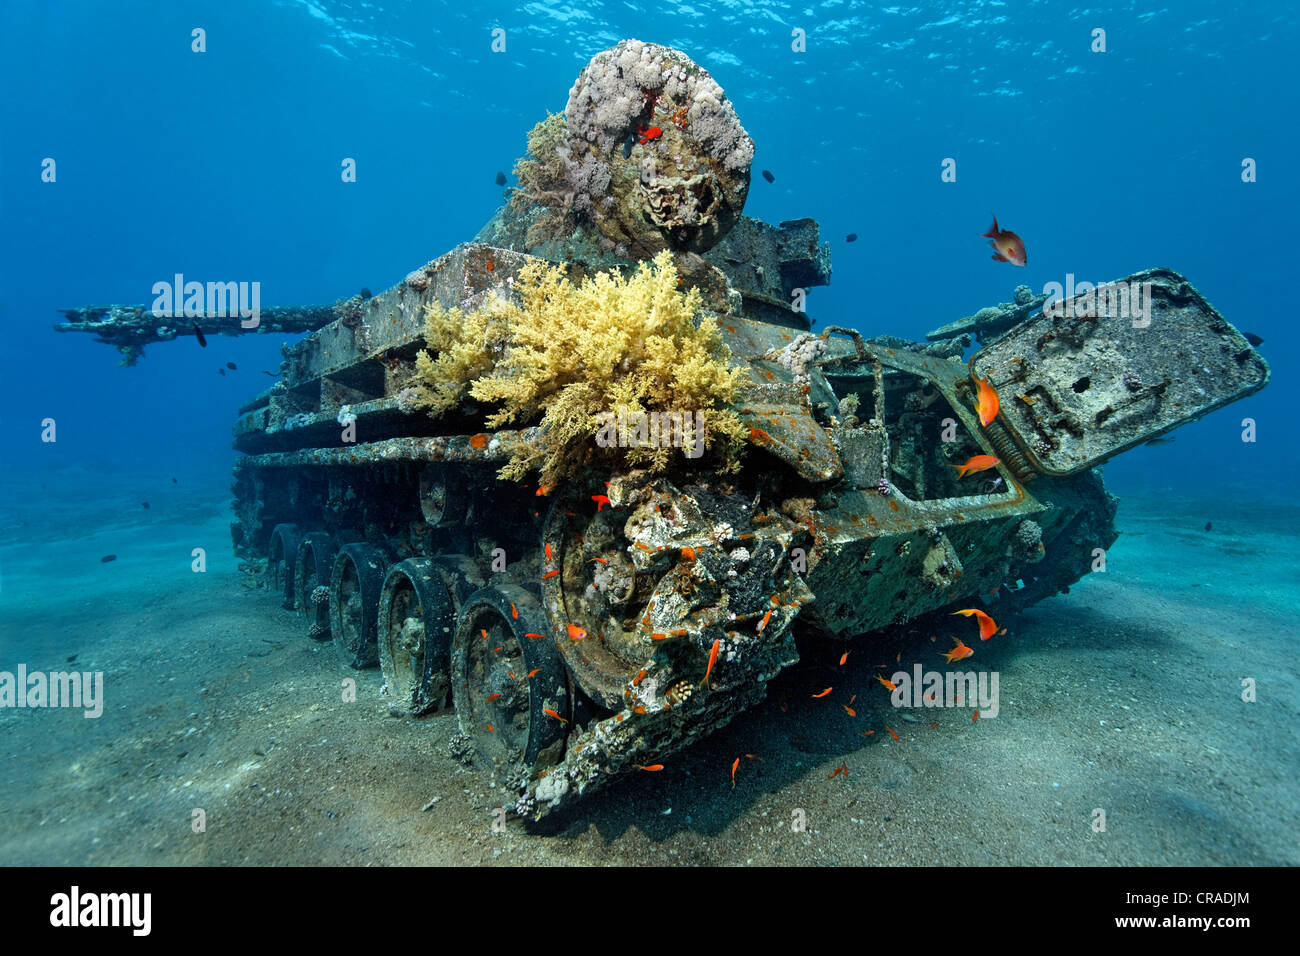 American tank M42 Duster with self-propelled 40mm anti-tircraft gun, wreck, Hashemite Kingdom of Jordan, Red Sea, - Stock Image